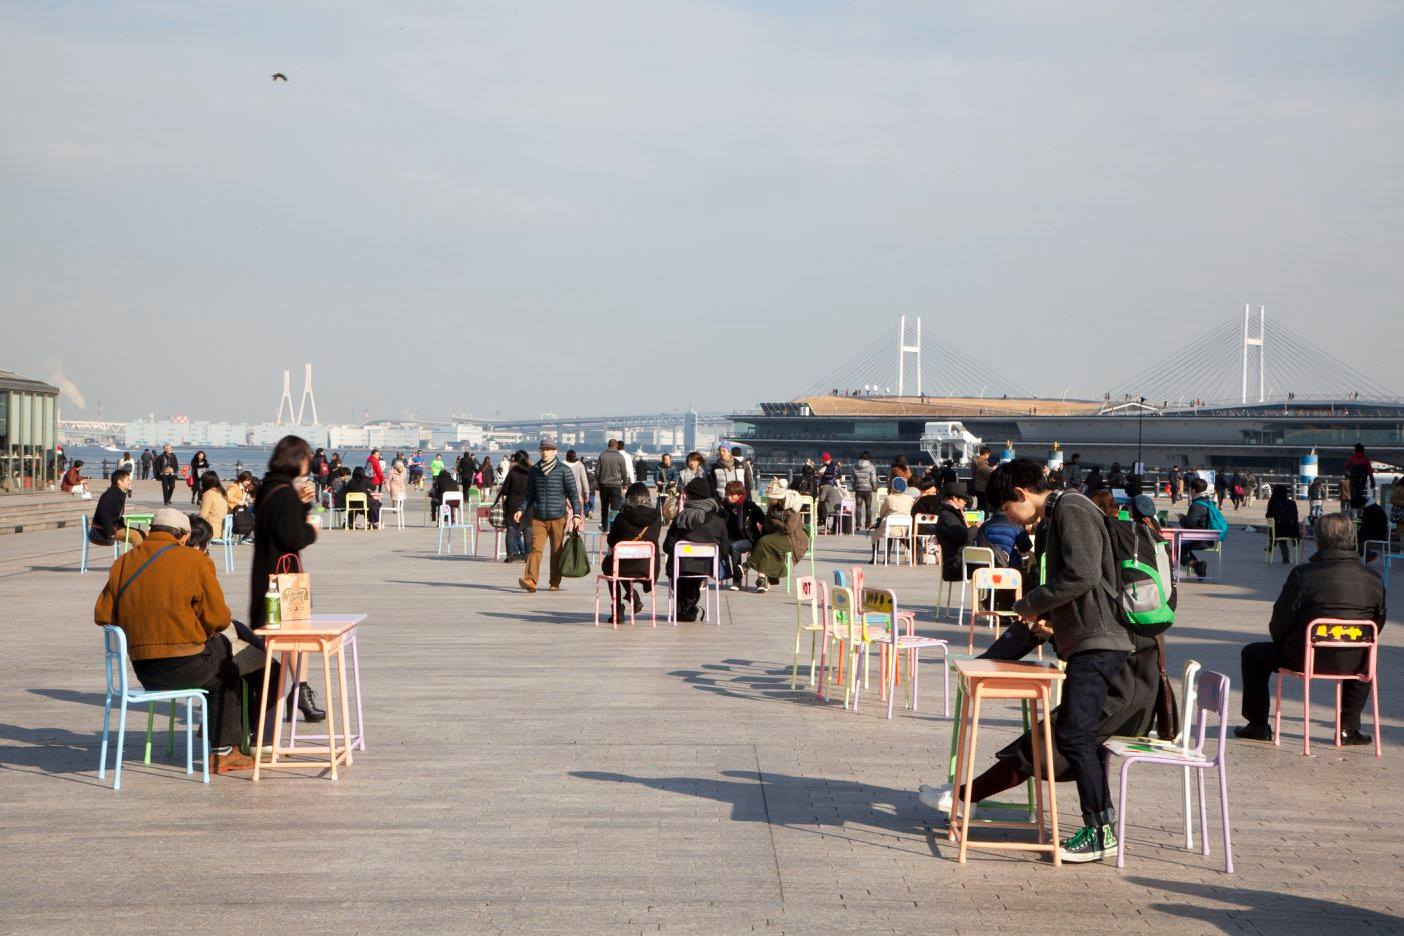 photo by 慶應義塾大学ホルヘ・アルマザン建築デザイン研究室